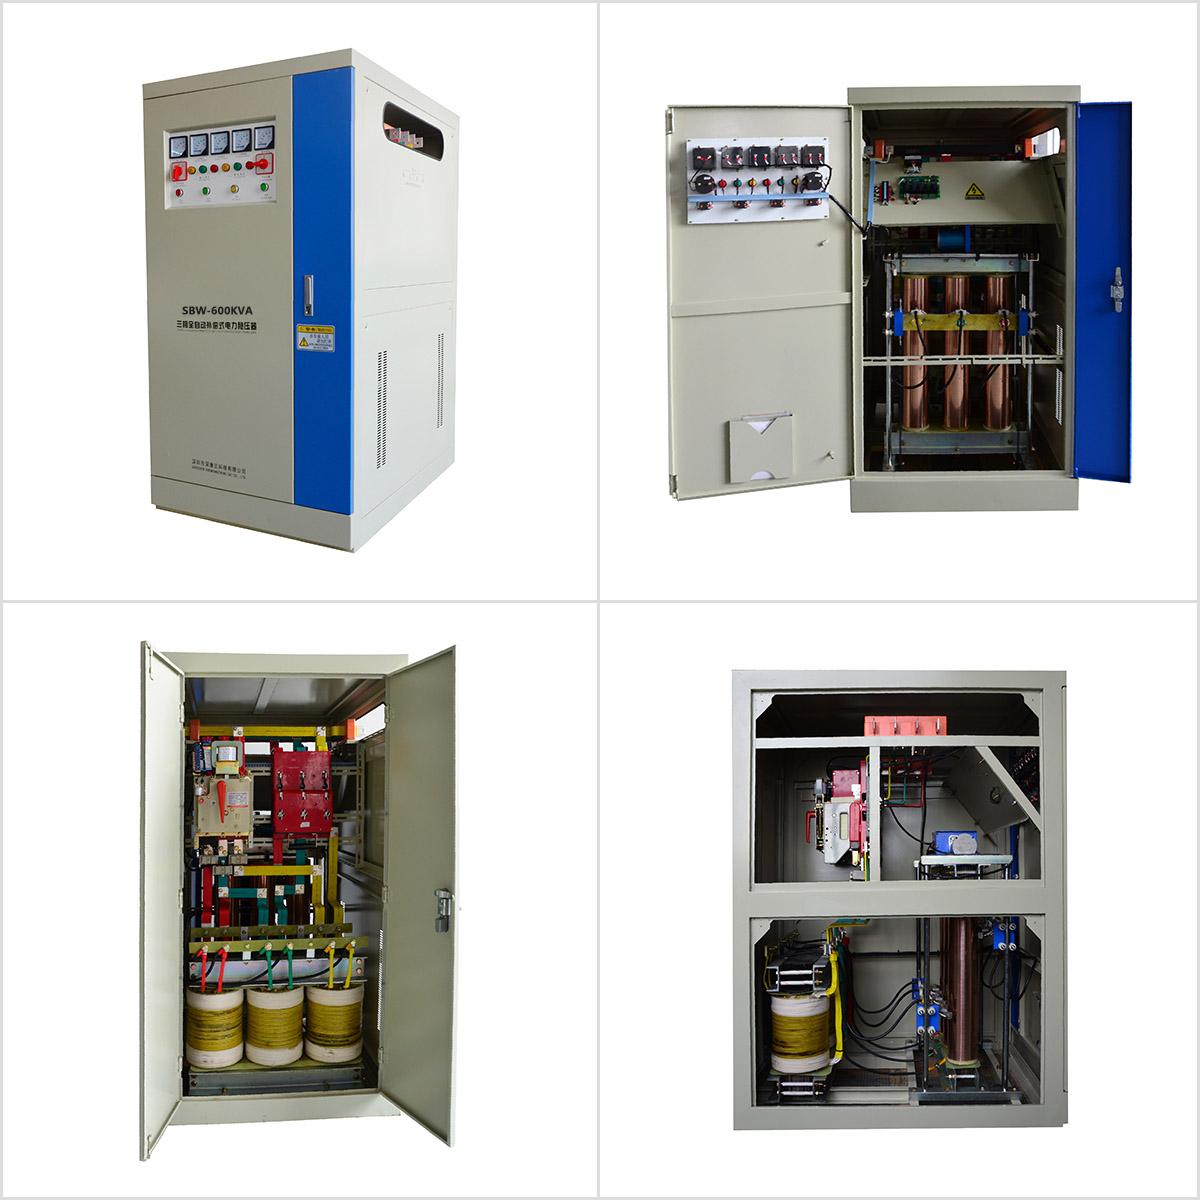 SBW Voltage Stabilizer 600KVA